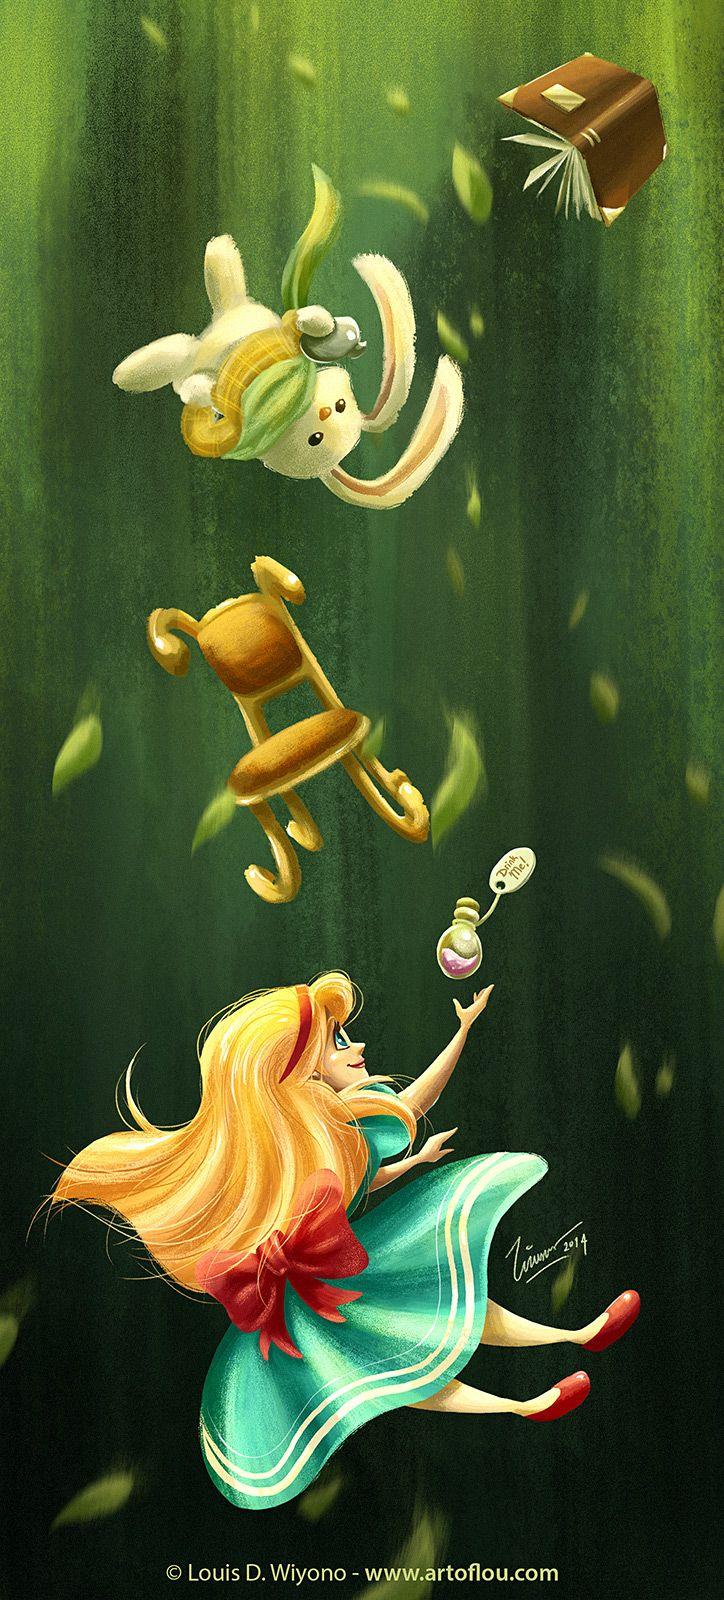 Alice In Wonderland - by Louis D. Wiyono, Wizmaya Design Studio  #illustration #kidlitart #disney #kidlitart